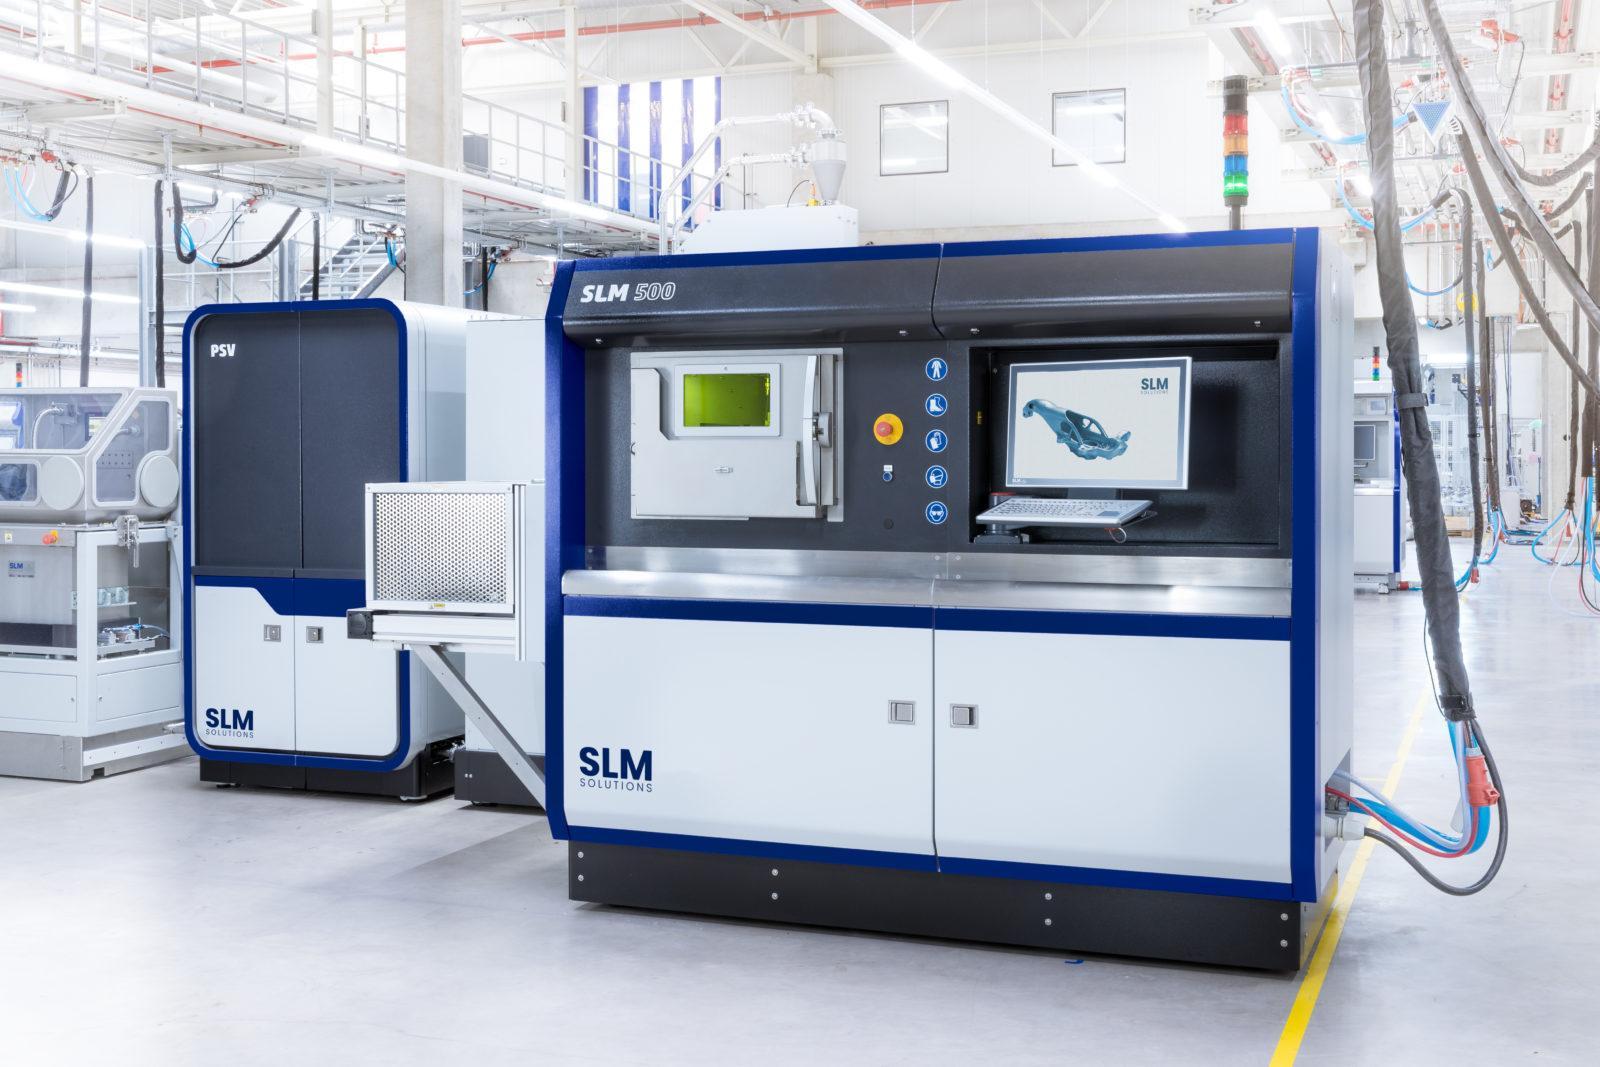 SLM 500 machine